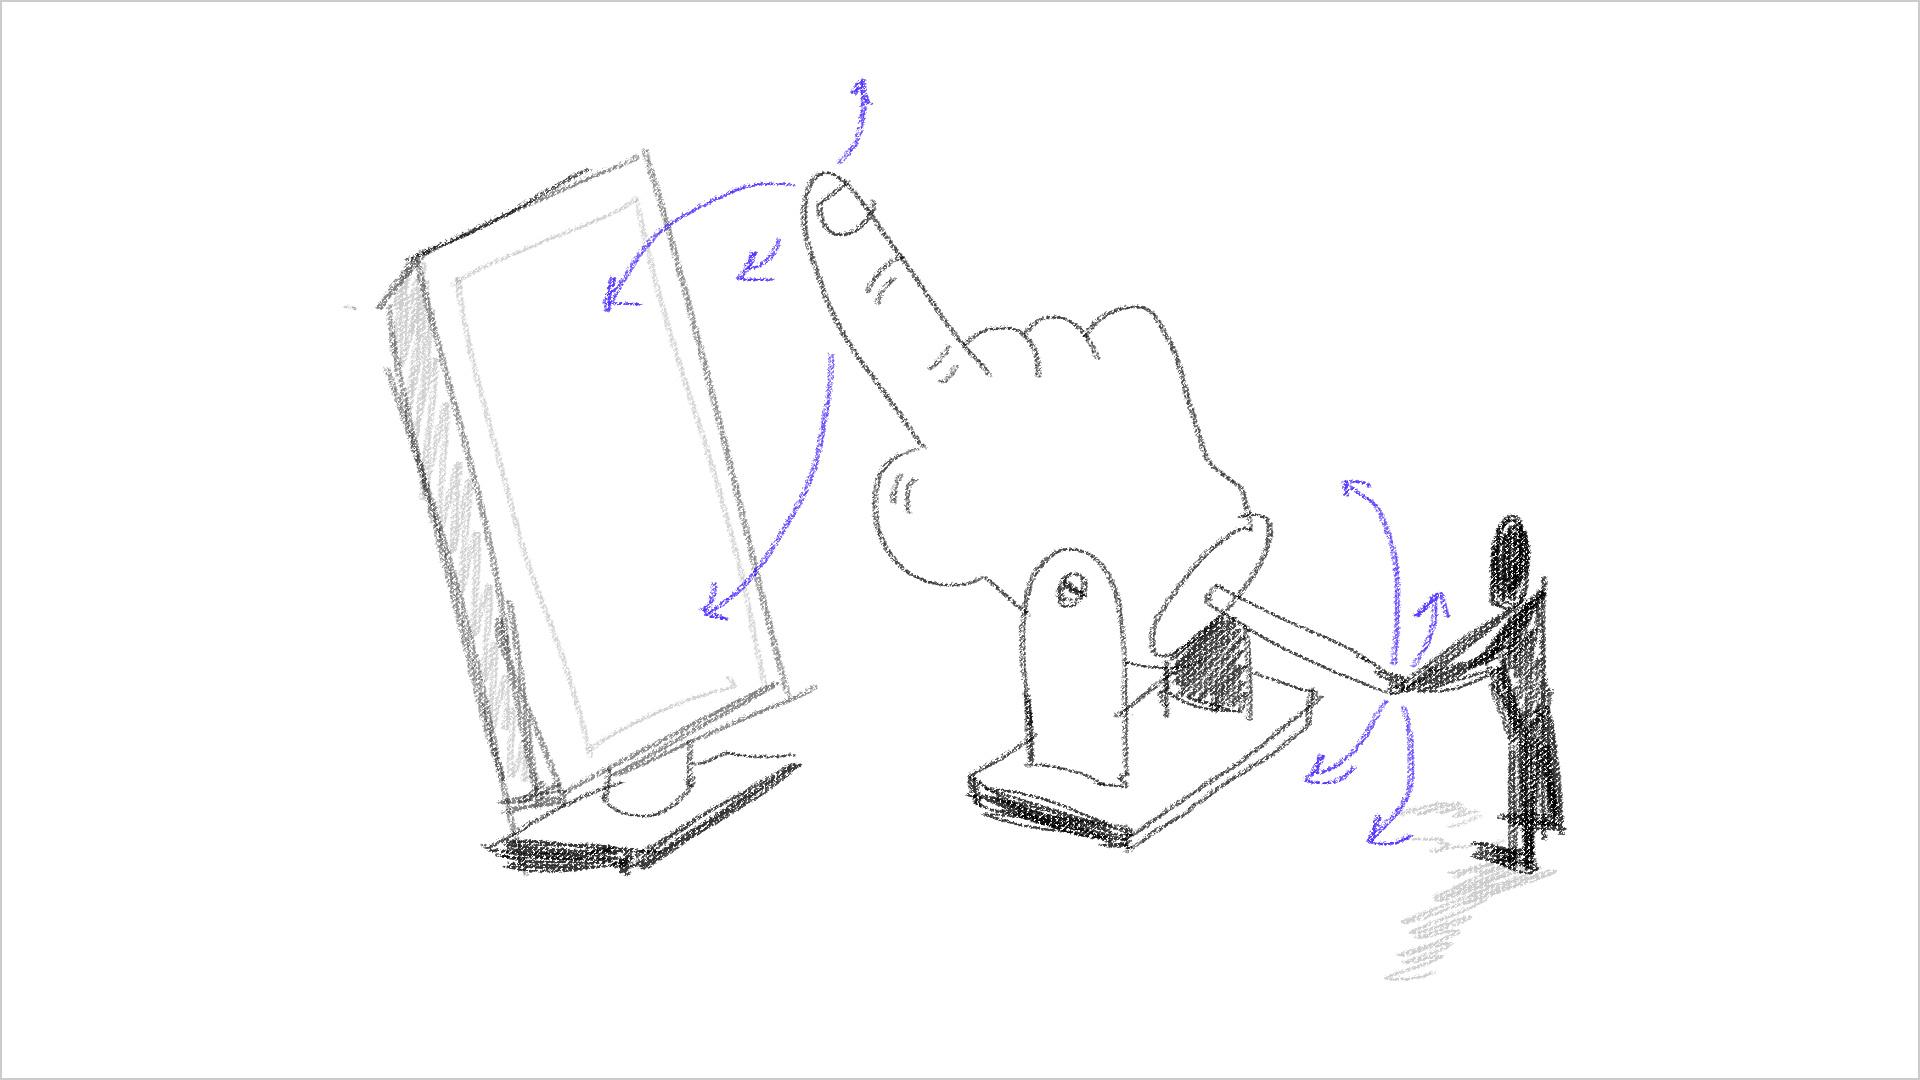 1_Sketches_1600_v2